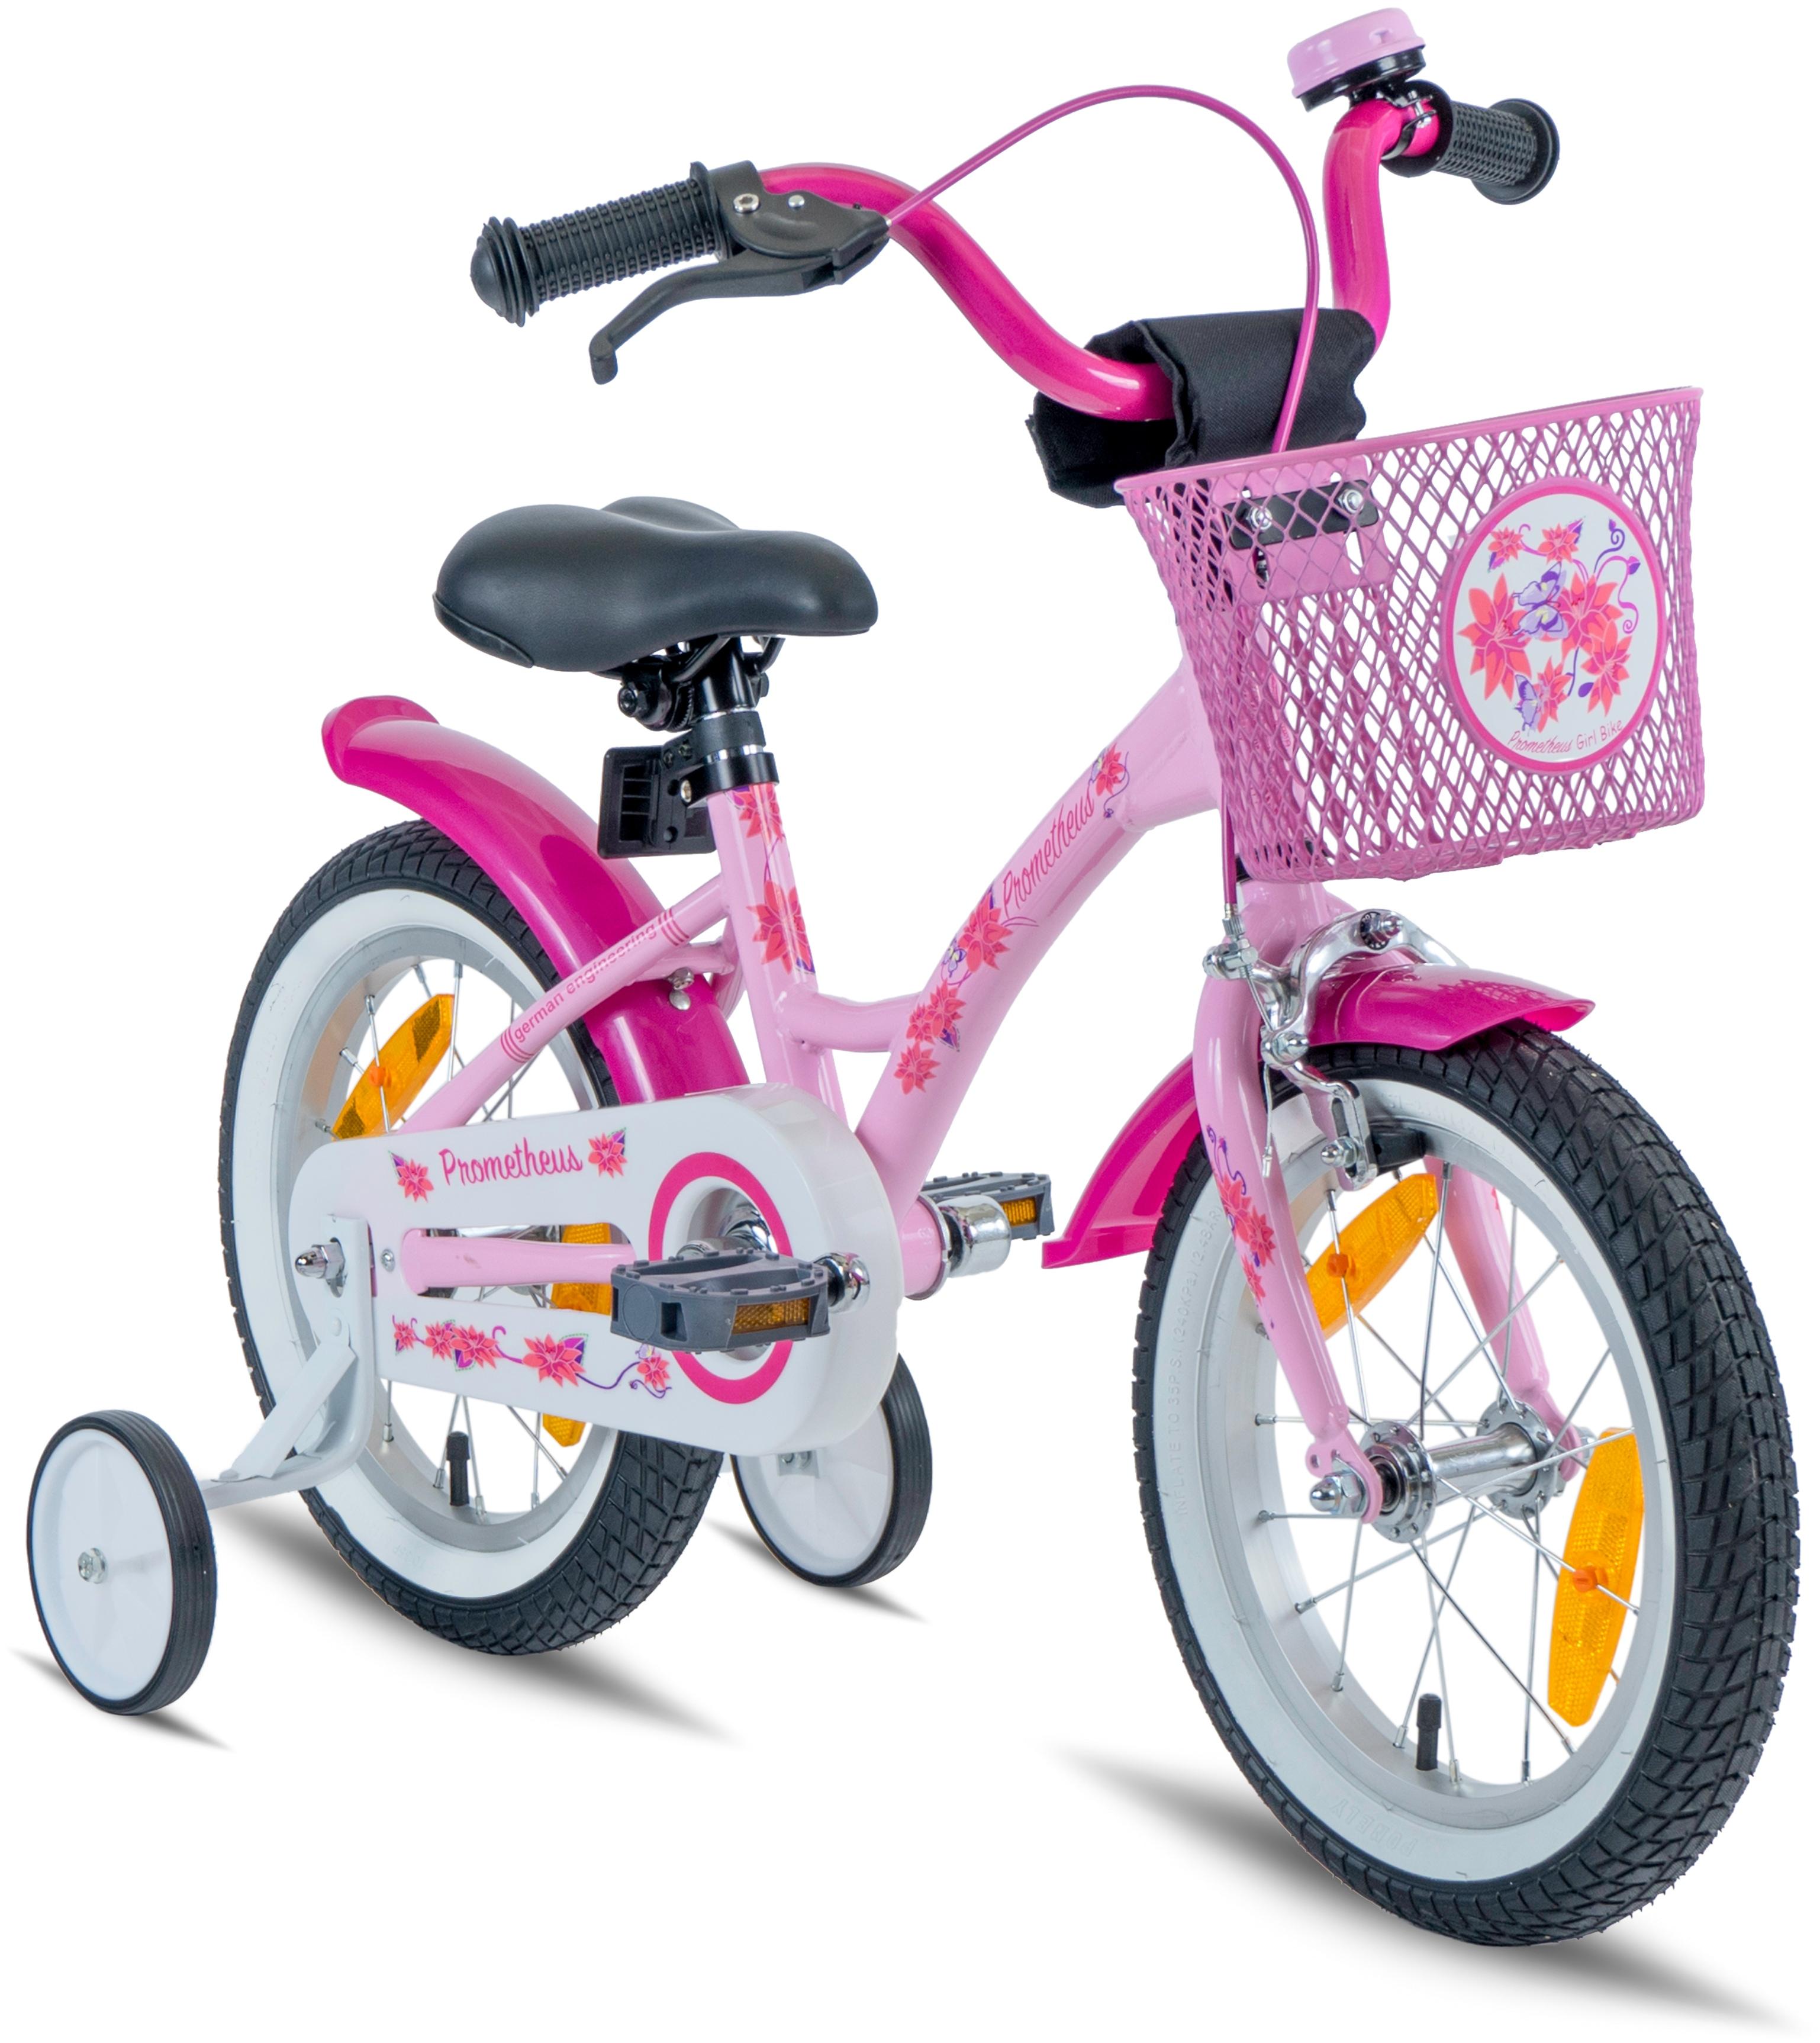 PROMETHEUS BICYCLES Kinderfahrrad Hawk, 1 Gang rosa Kinder Kinderfahrräder Fahrräder Zubehör Fahrrad